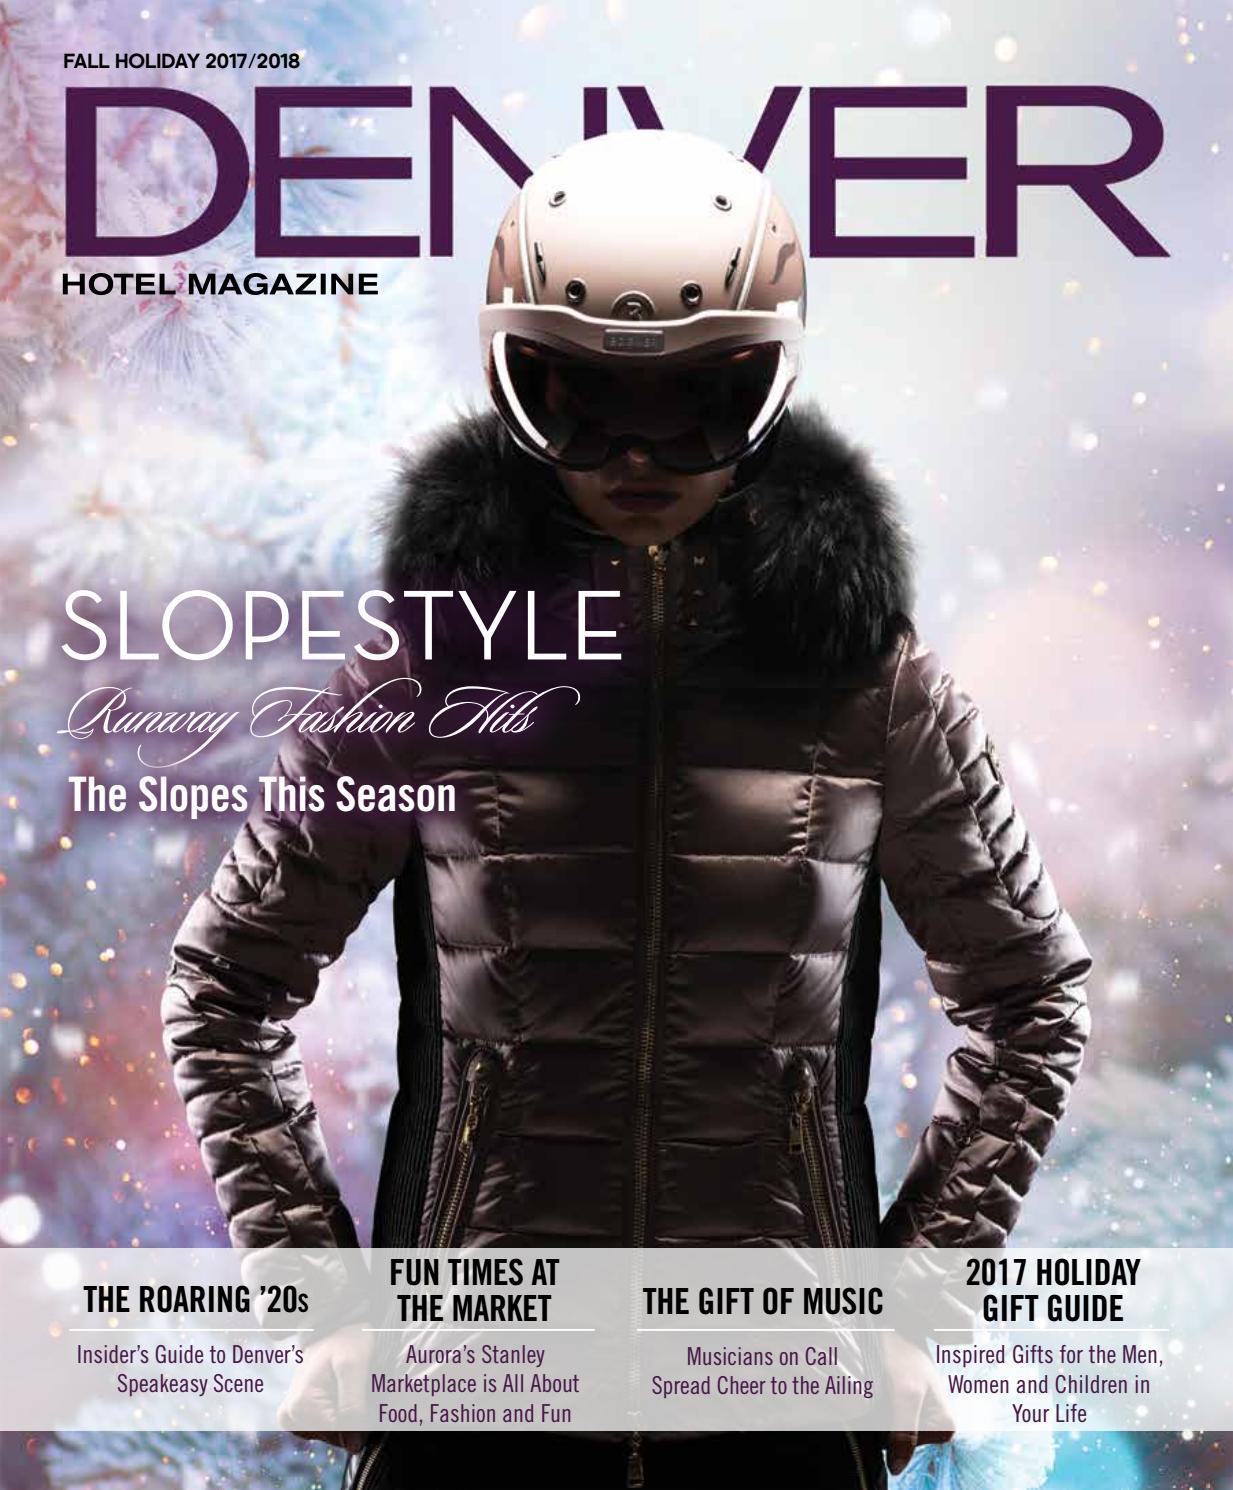 Denver Hotel Magazine - Fall/Holiday 2017/2018 by Dallas Hotel Magazine -  issuu